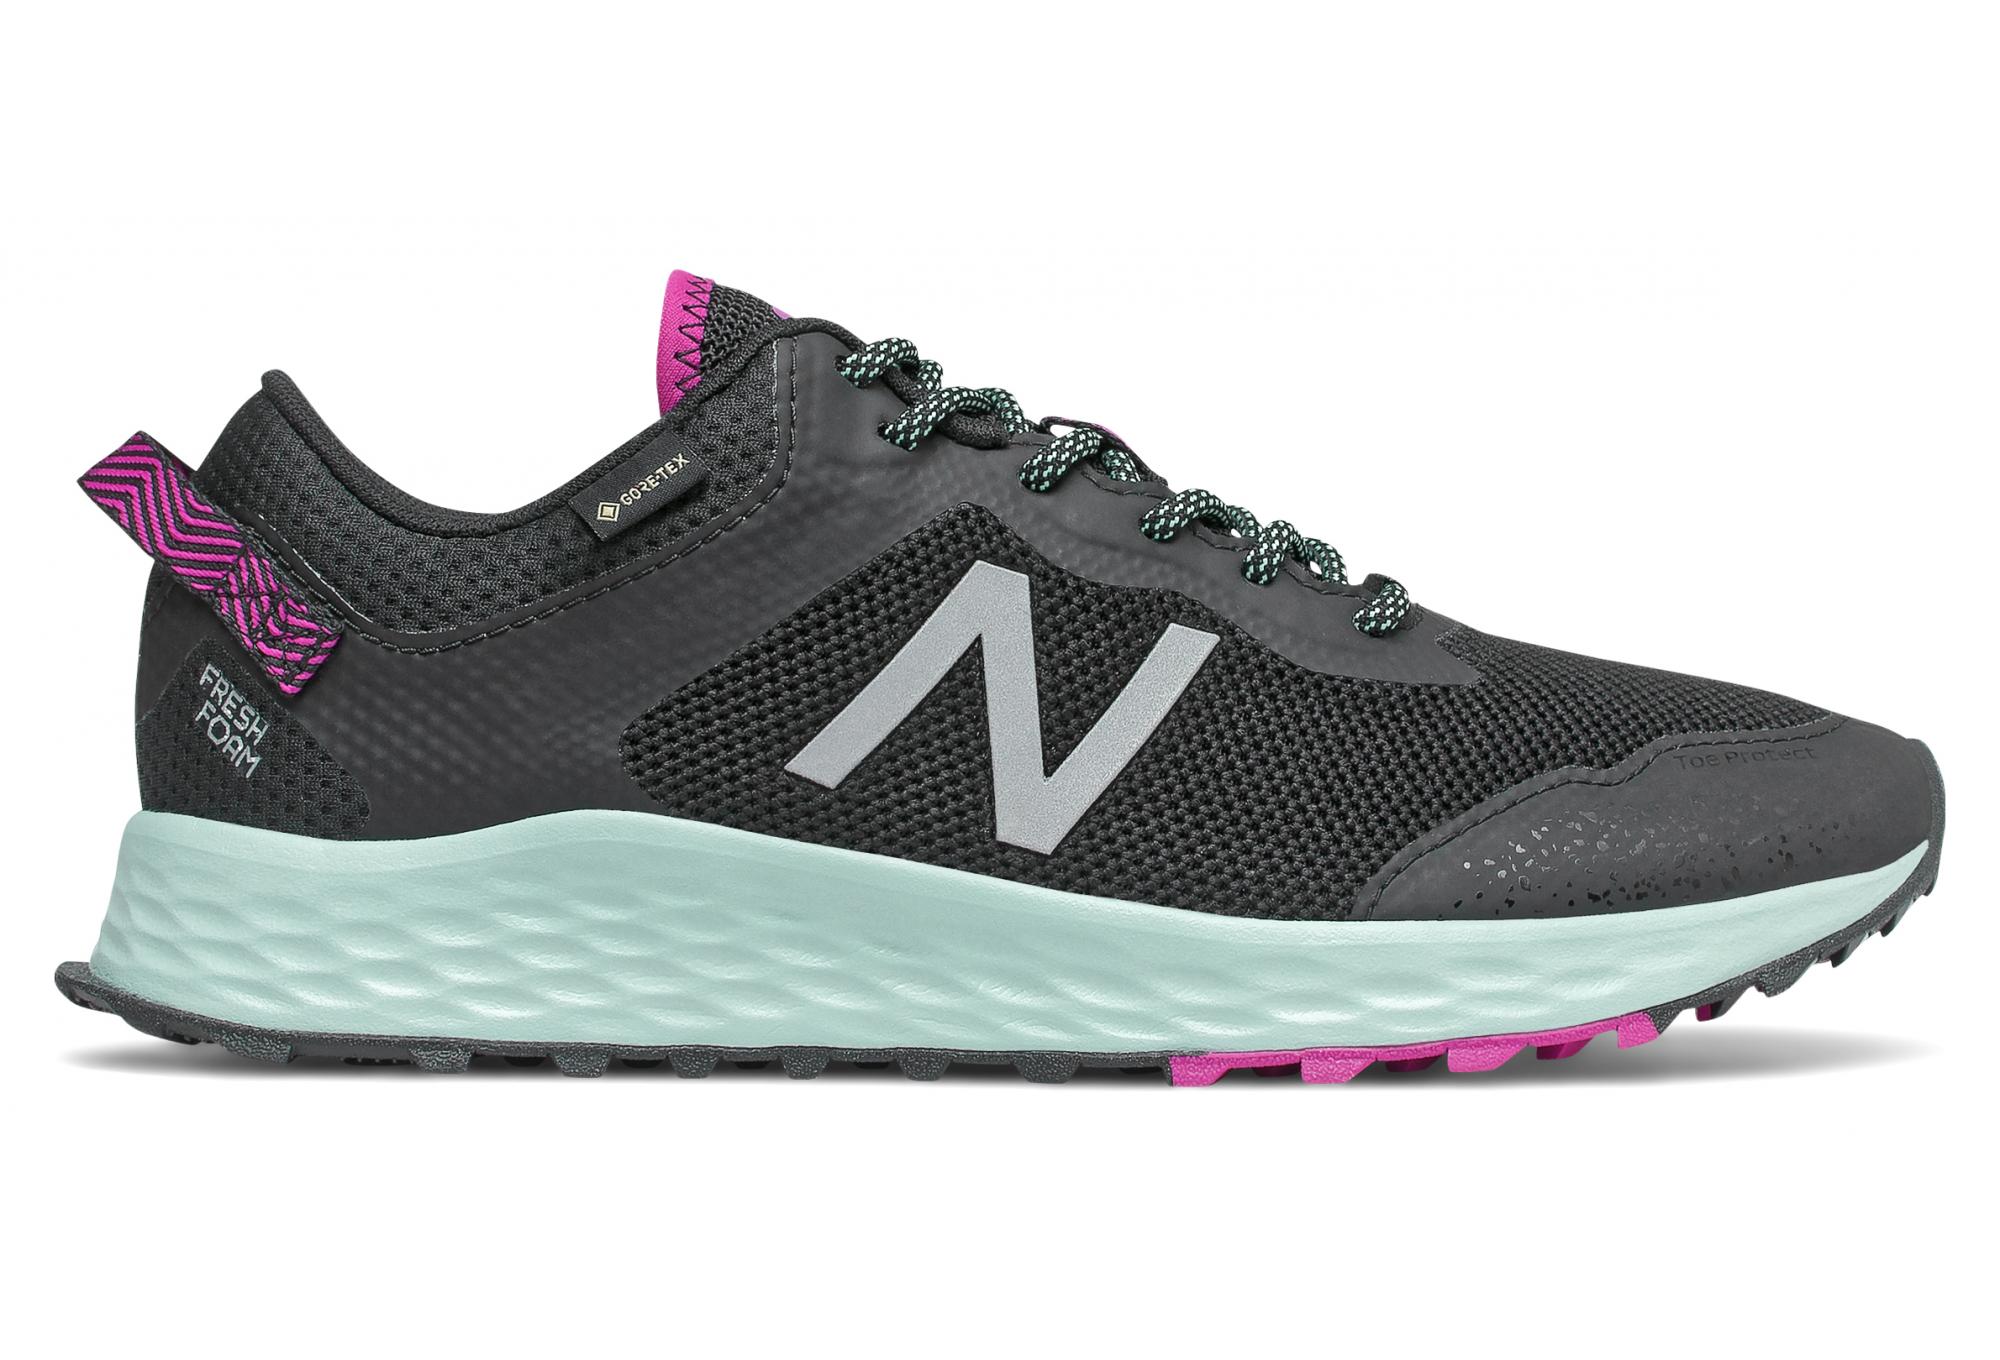 Chaussures de Trail Femme New Balance Fresh Foam Trail Arishi GTX ...